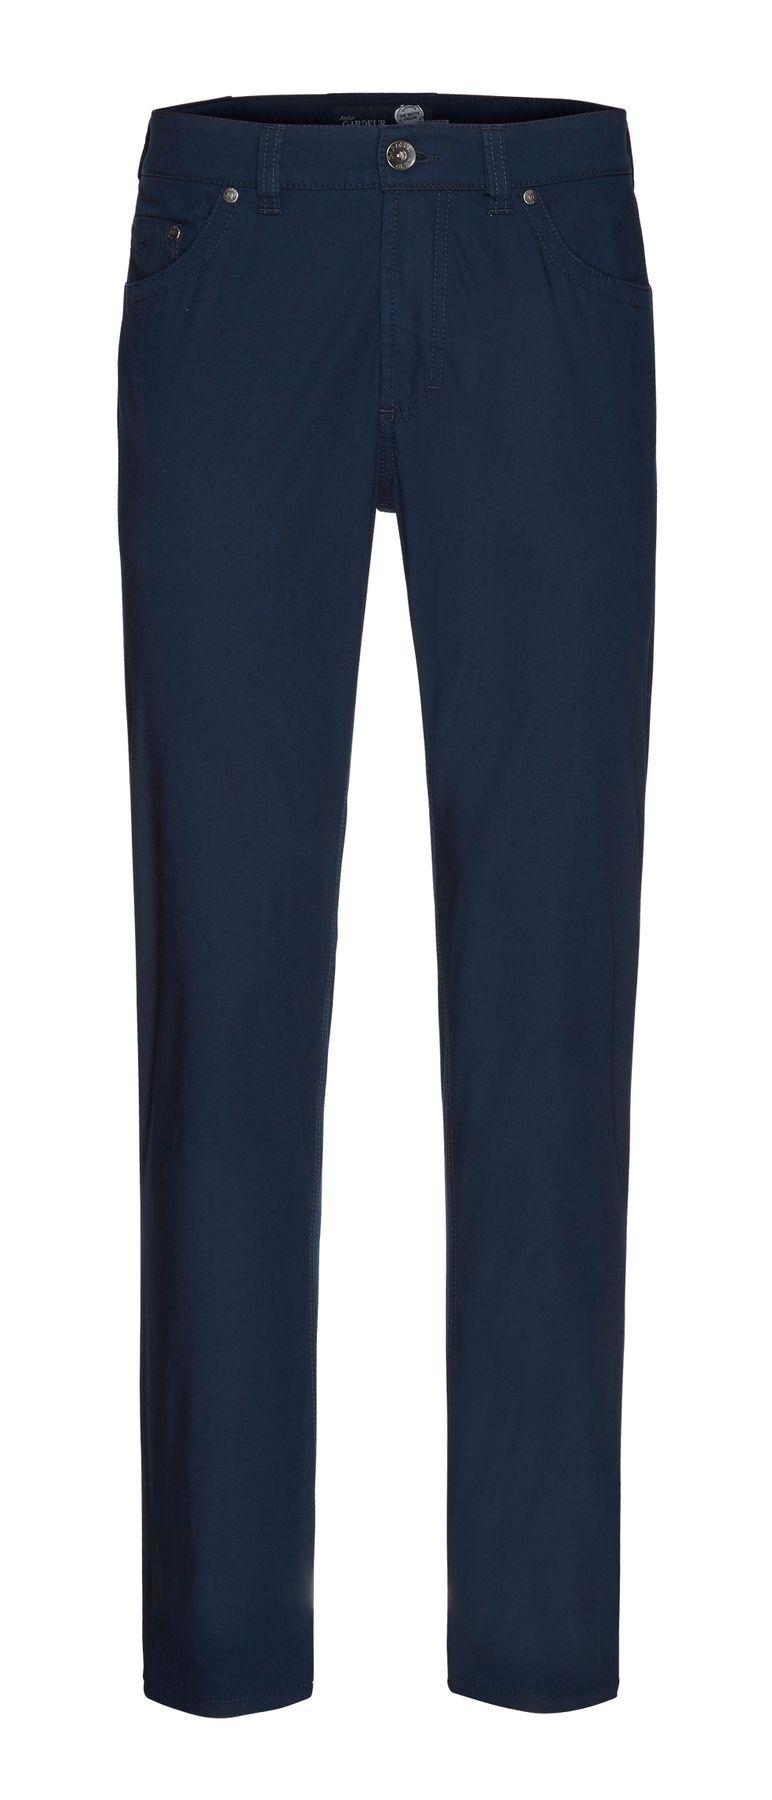 Atelier Gardeur - Modern Fit - Herren 5-Pocket Jeans, Bill-11K (410031) – Bild 7